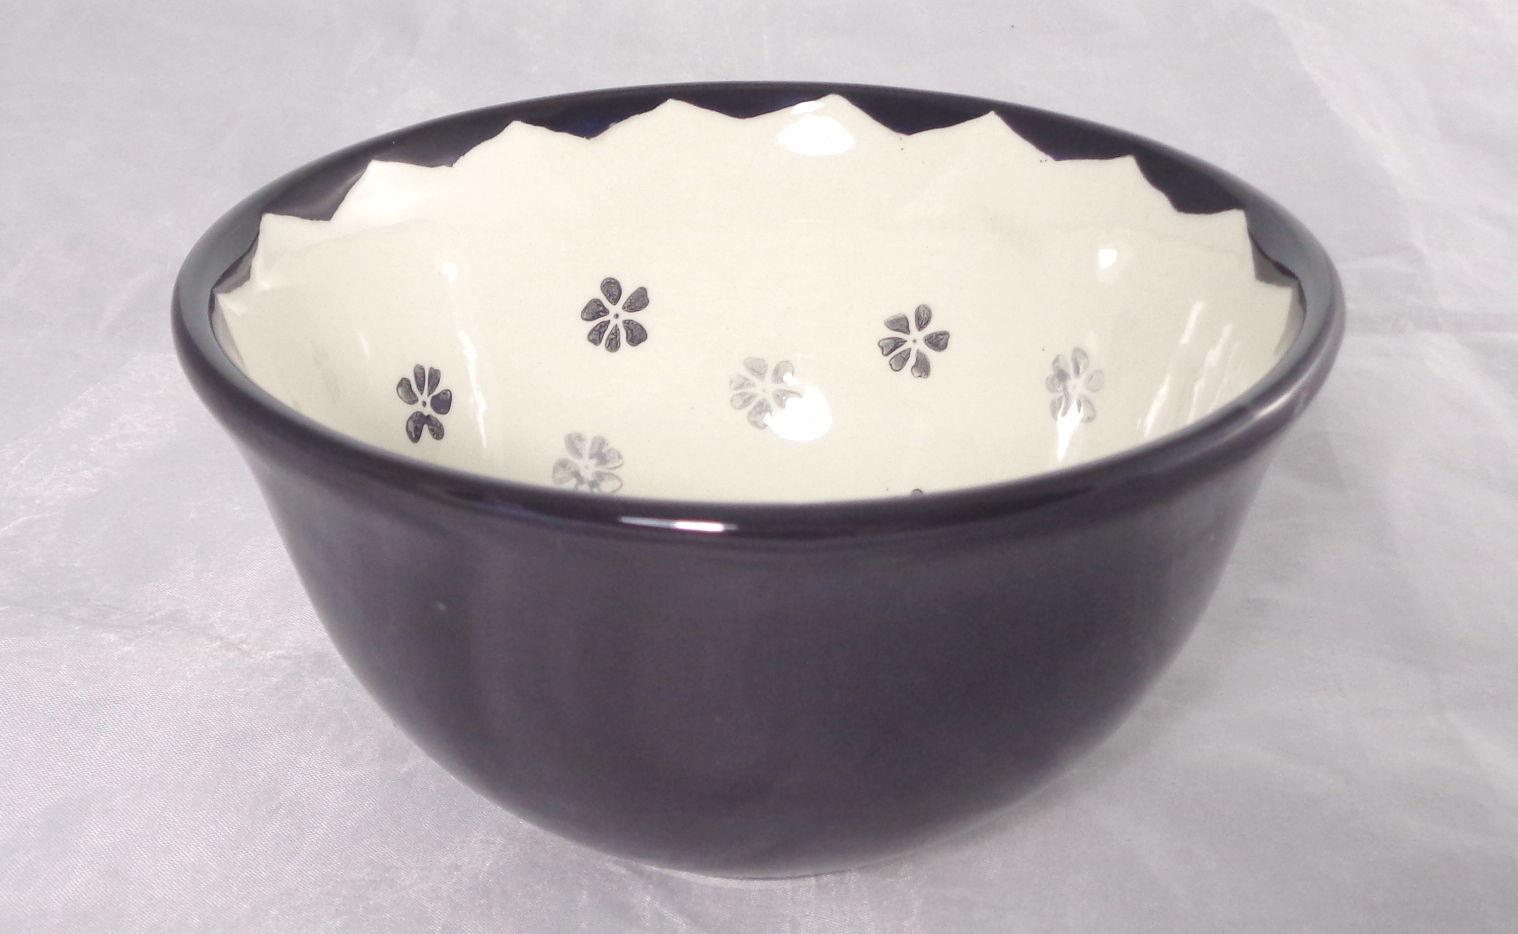 Bemalte Keramik schwarze Vintage-Schale Stemps